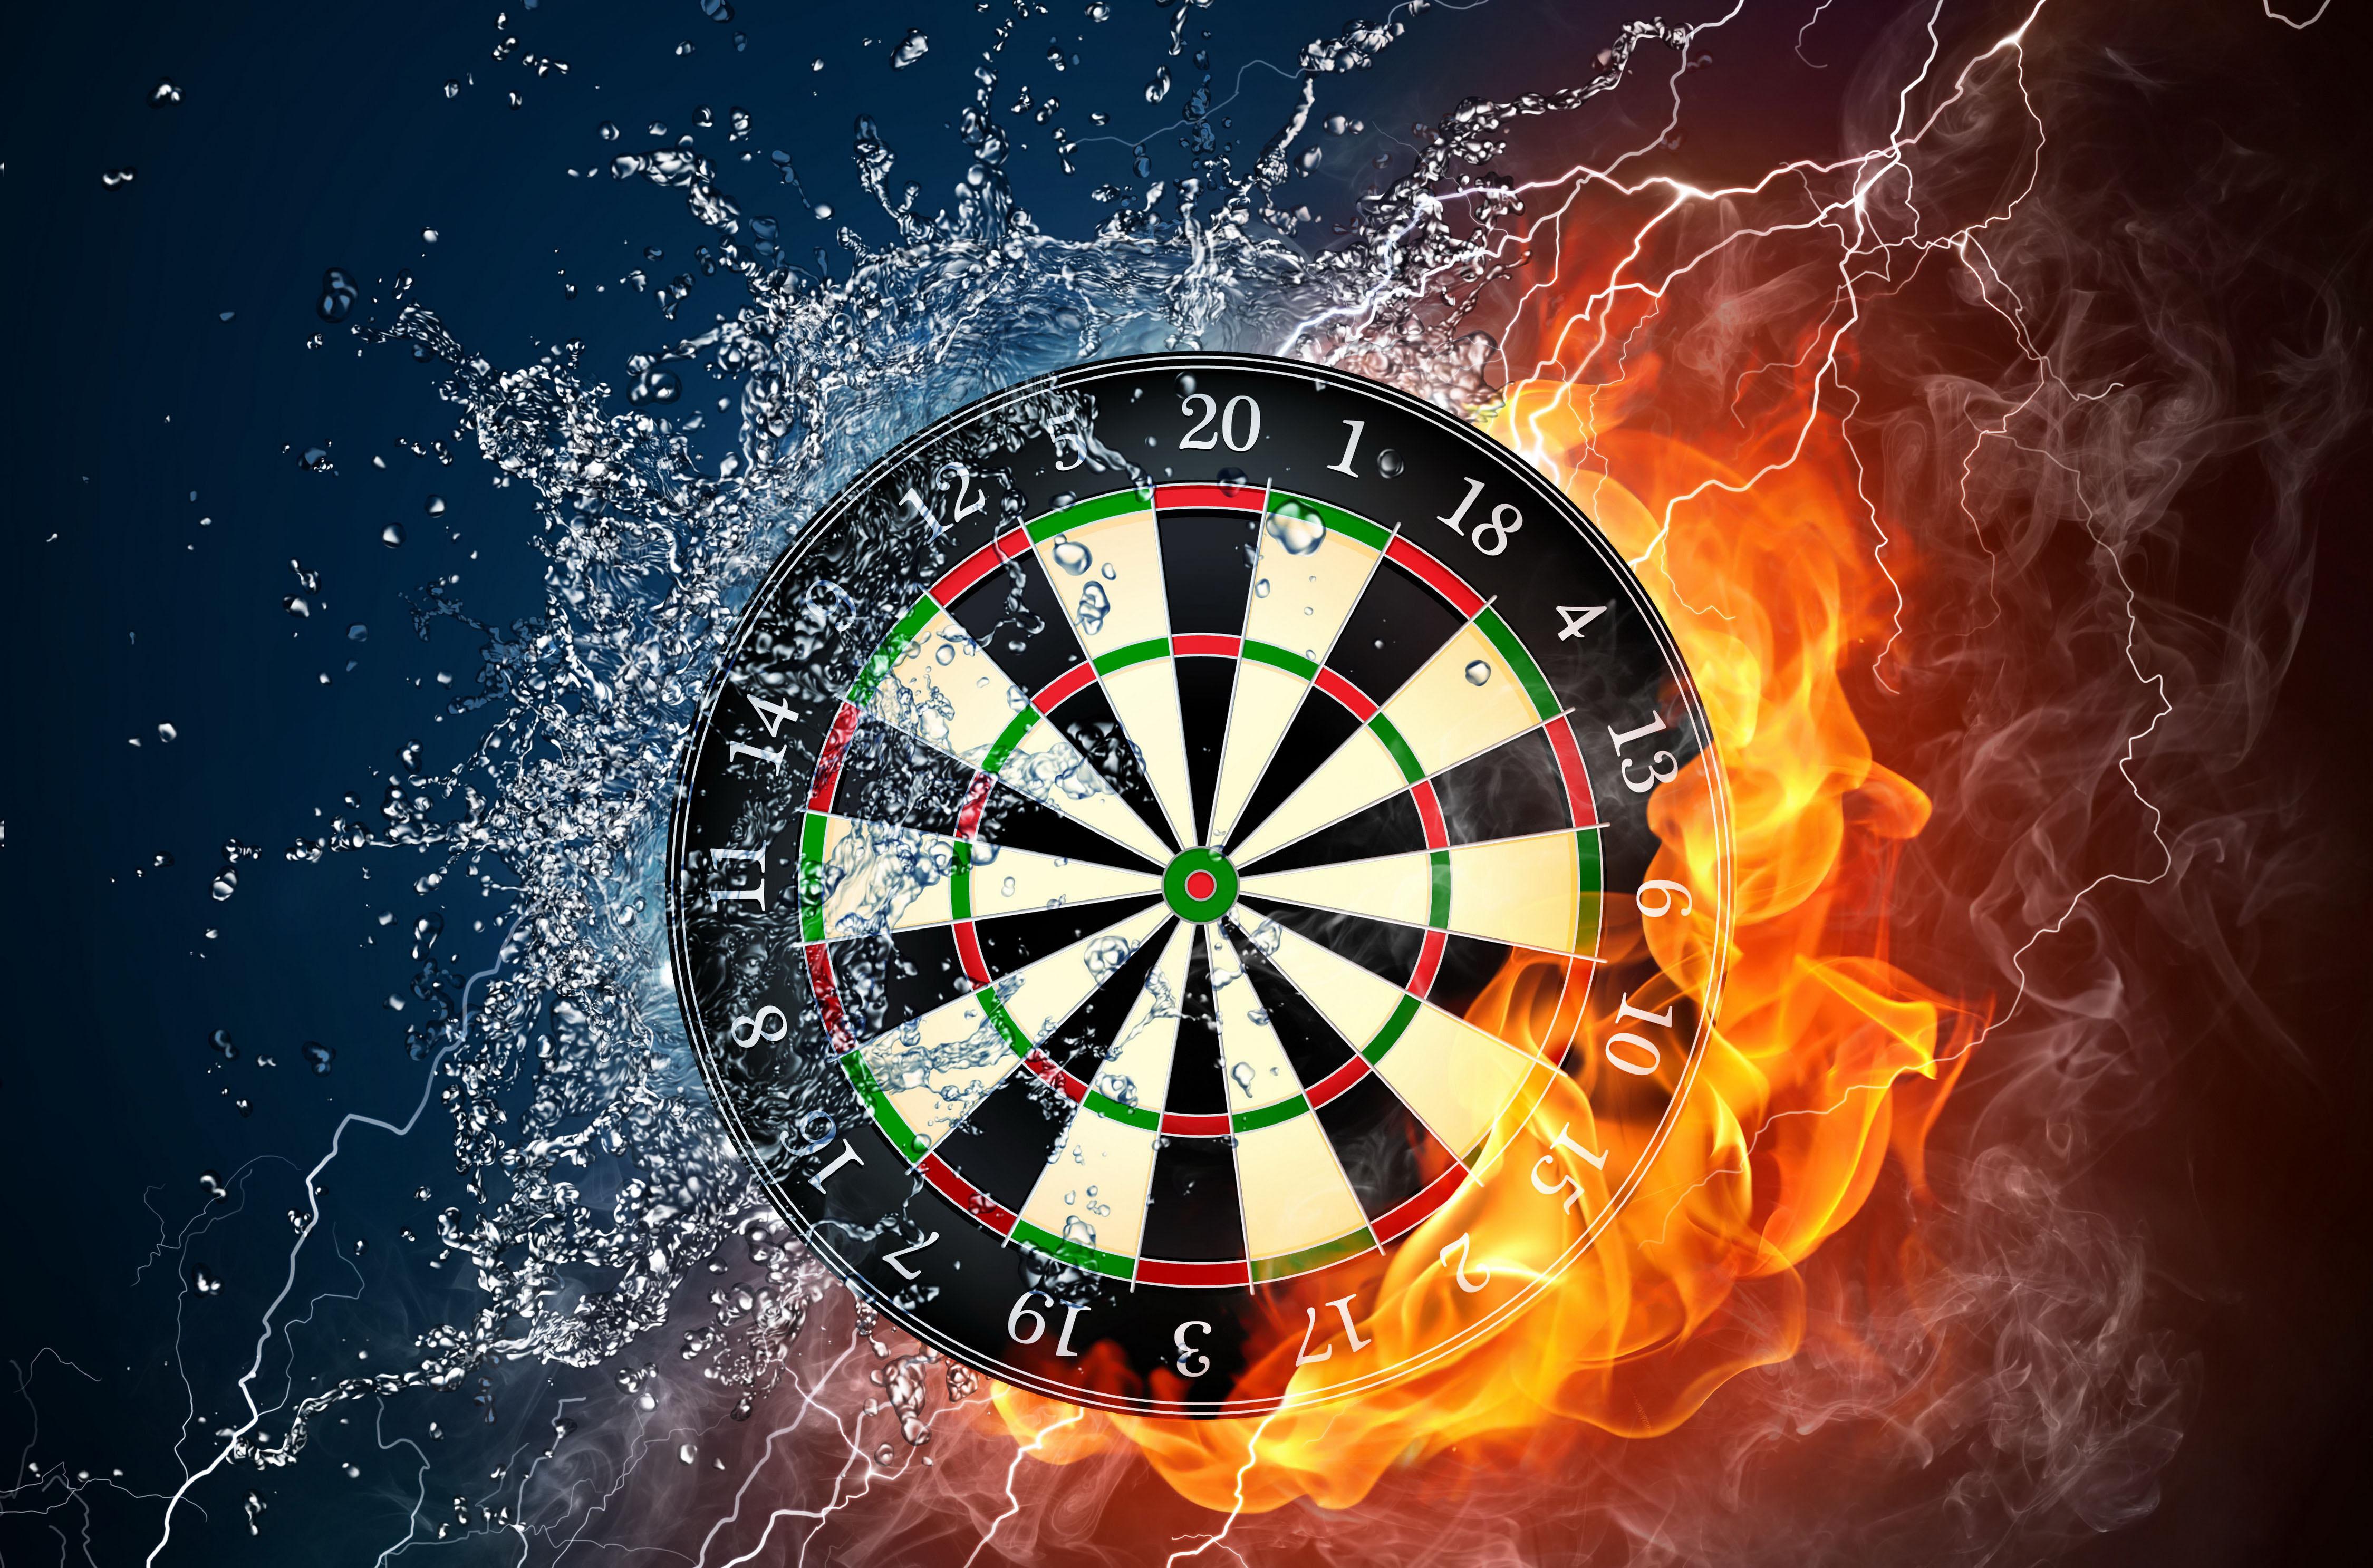 Artistic Dart Board Darts Elemental Fire Flame Water 4500x2974